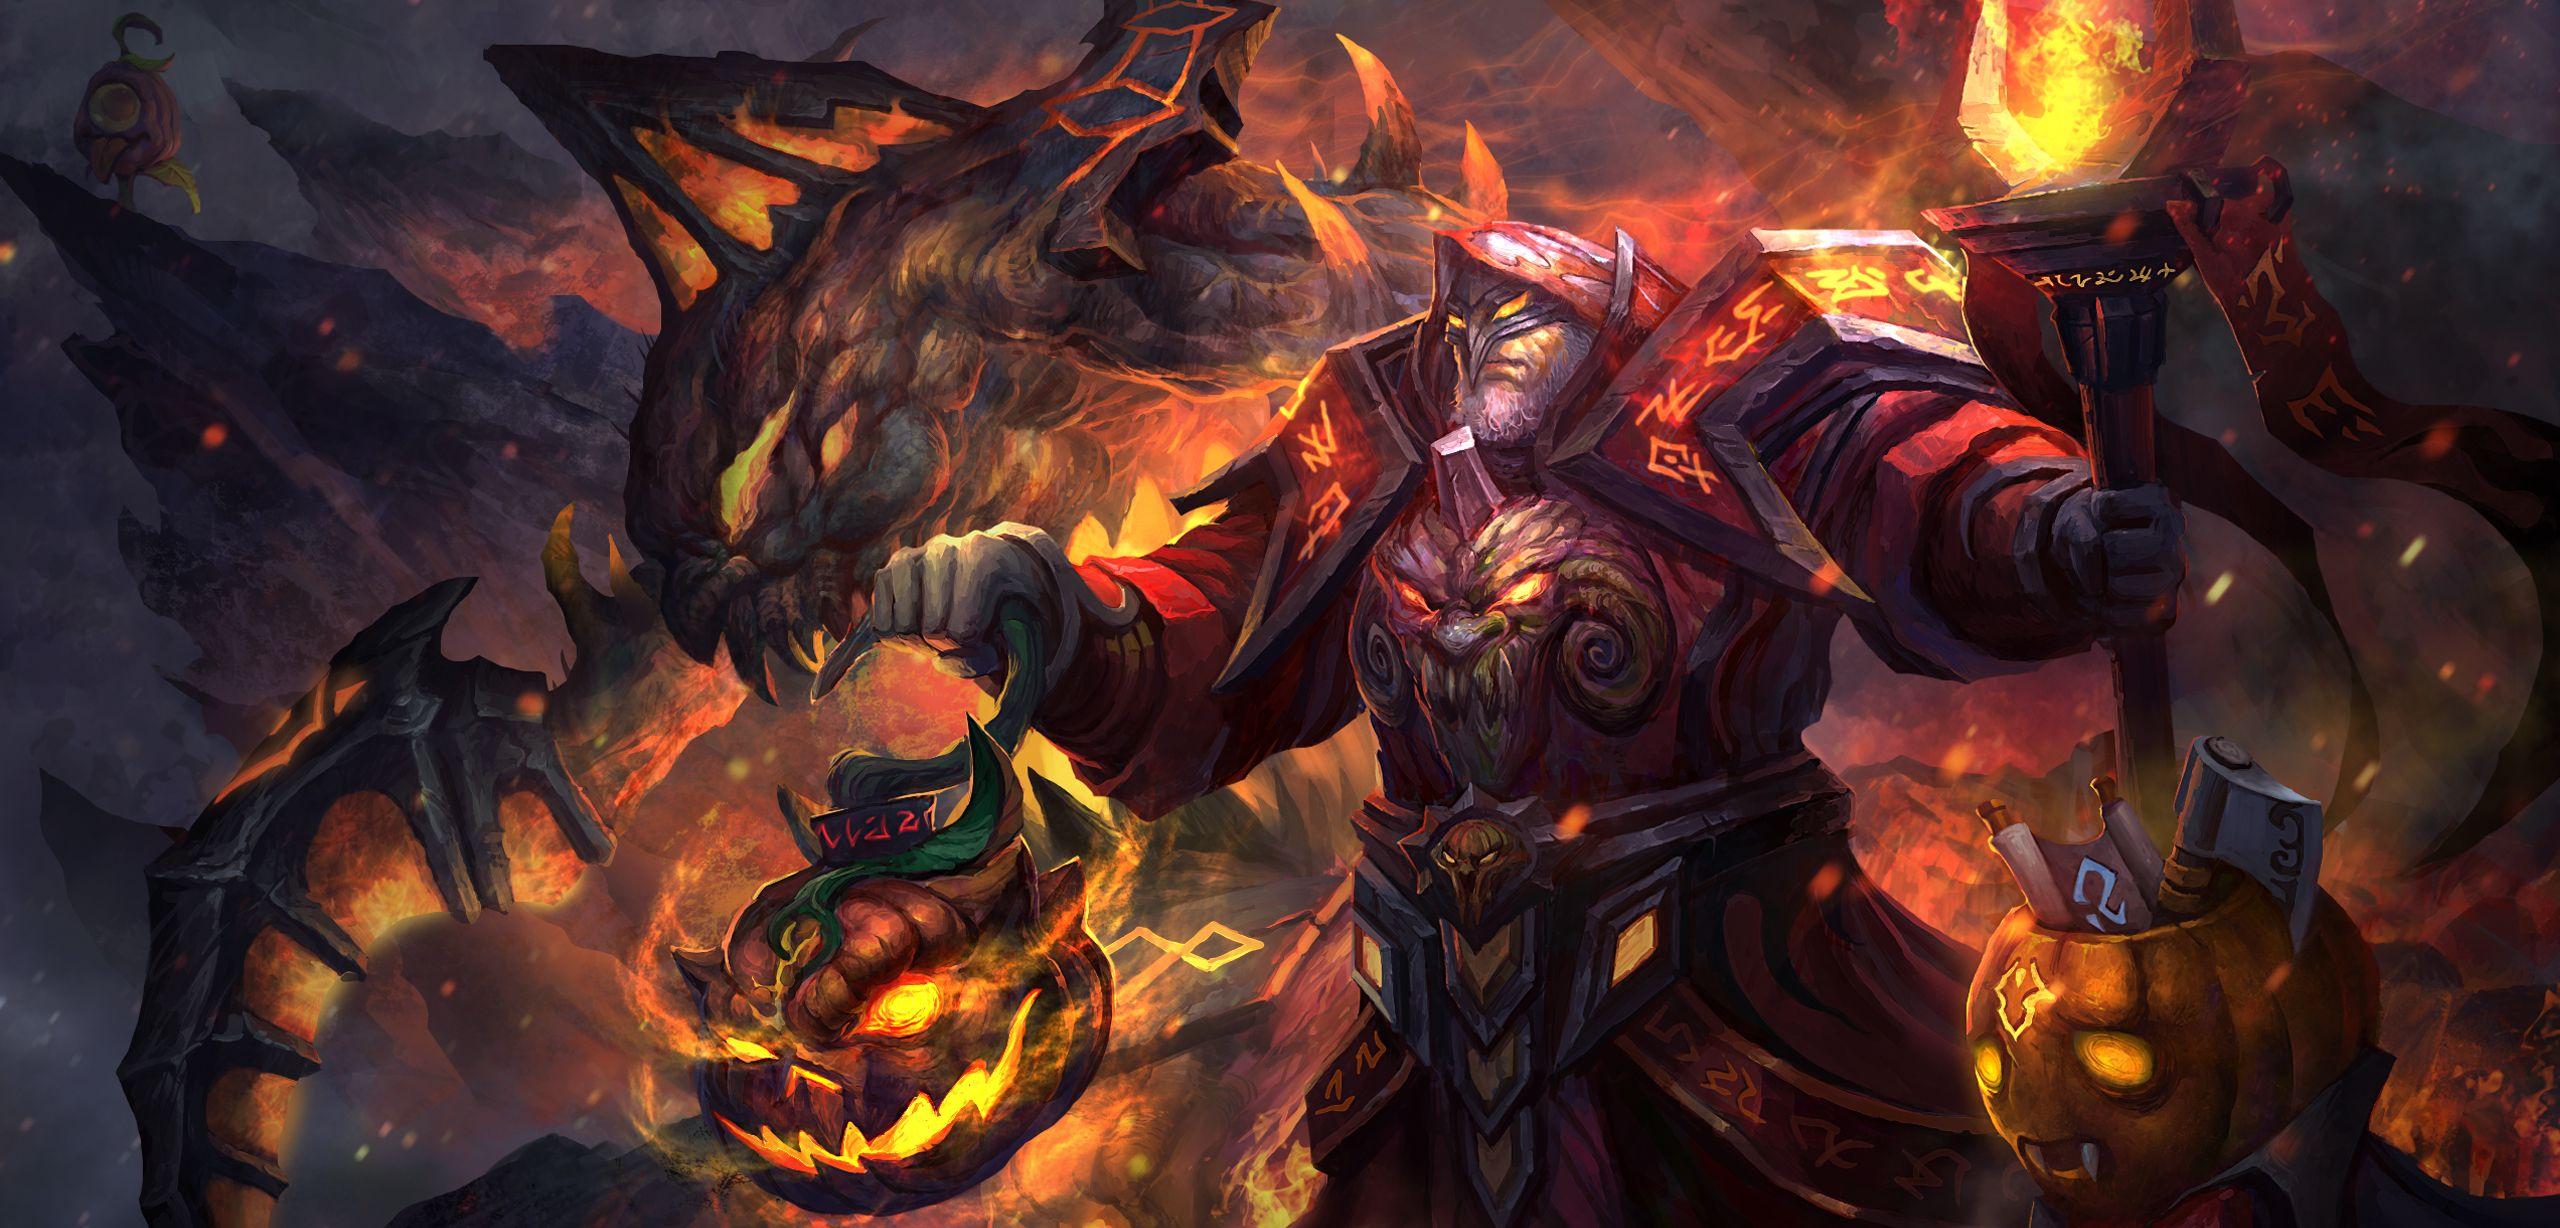 warlock: the simon's retribution wallpaper, more: http://dota2walls